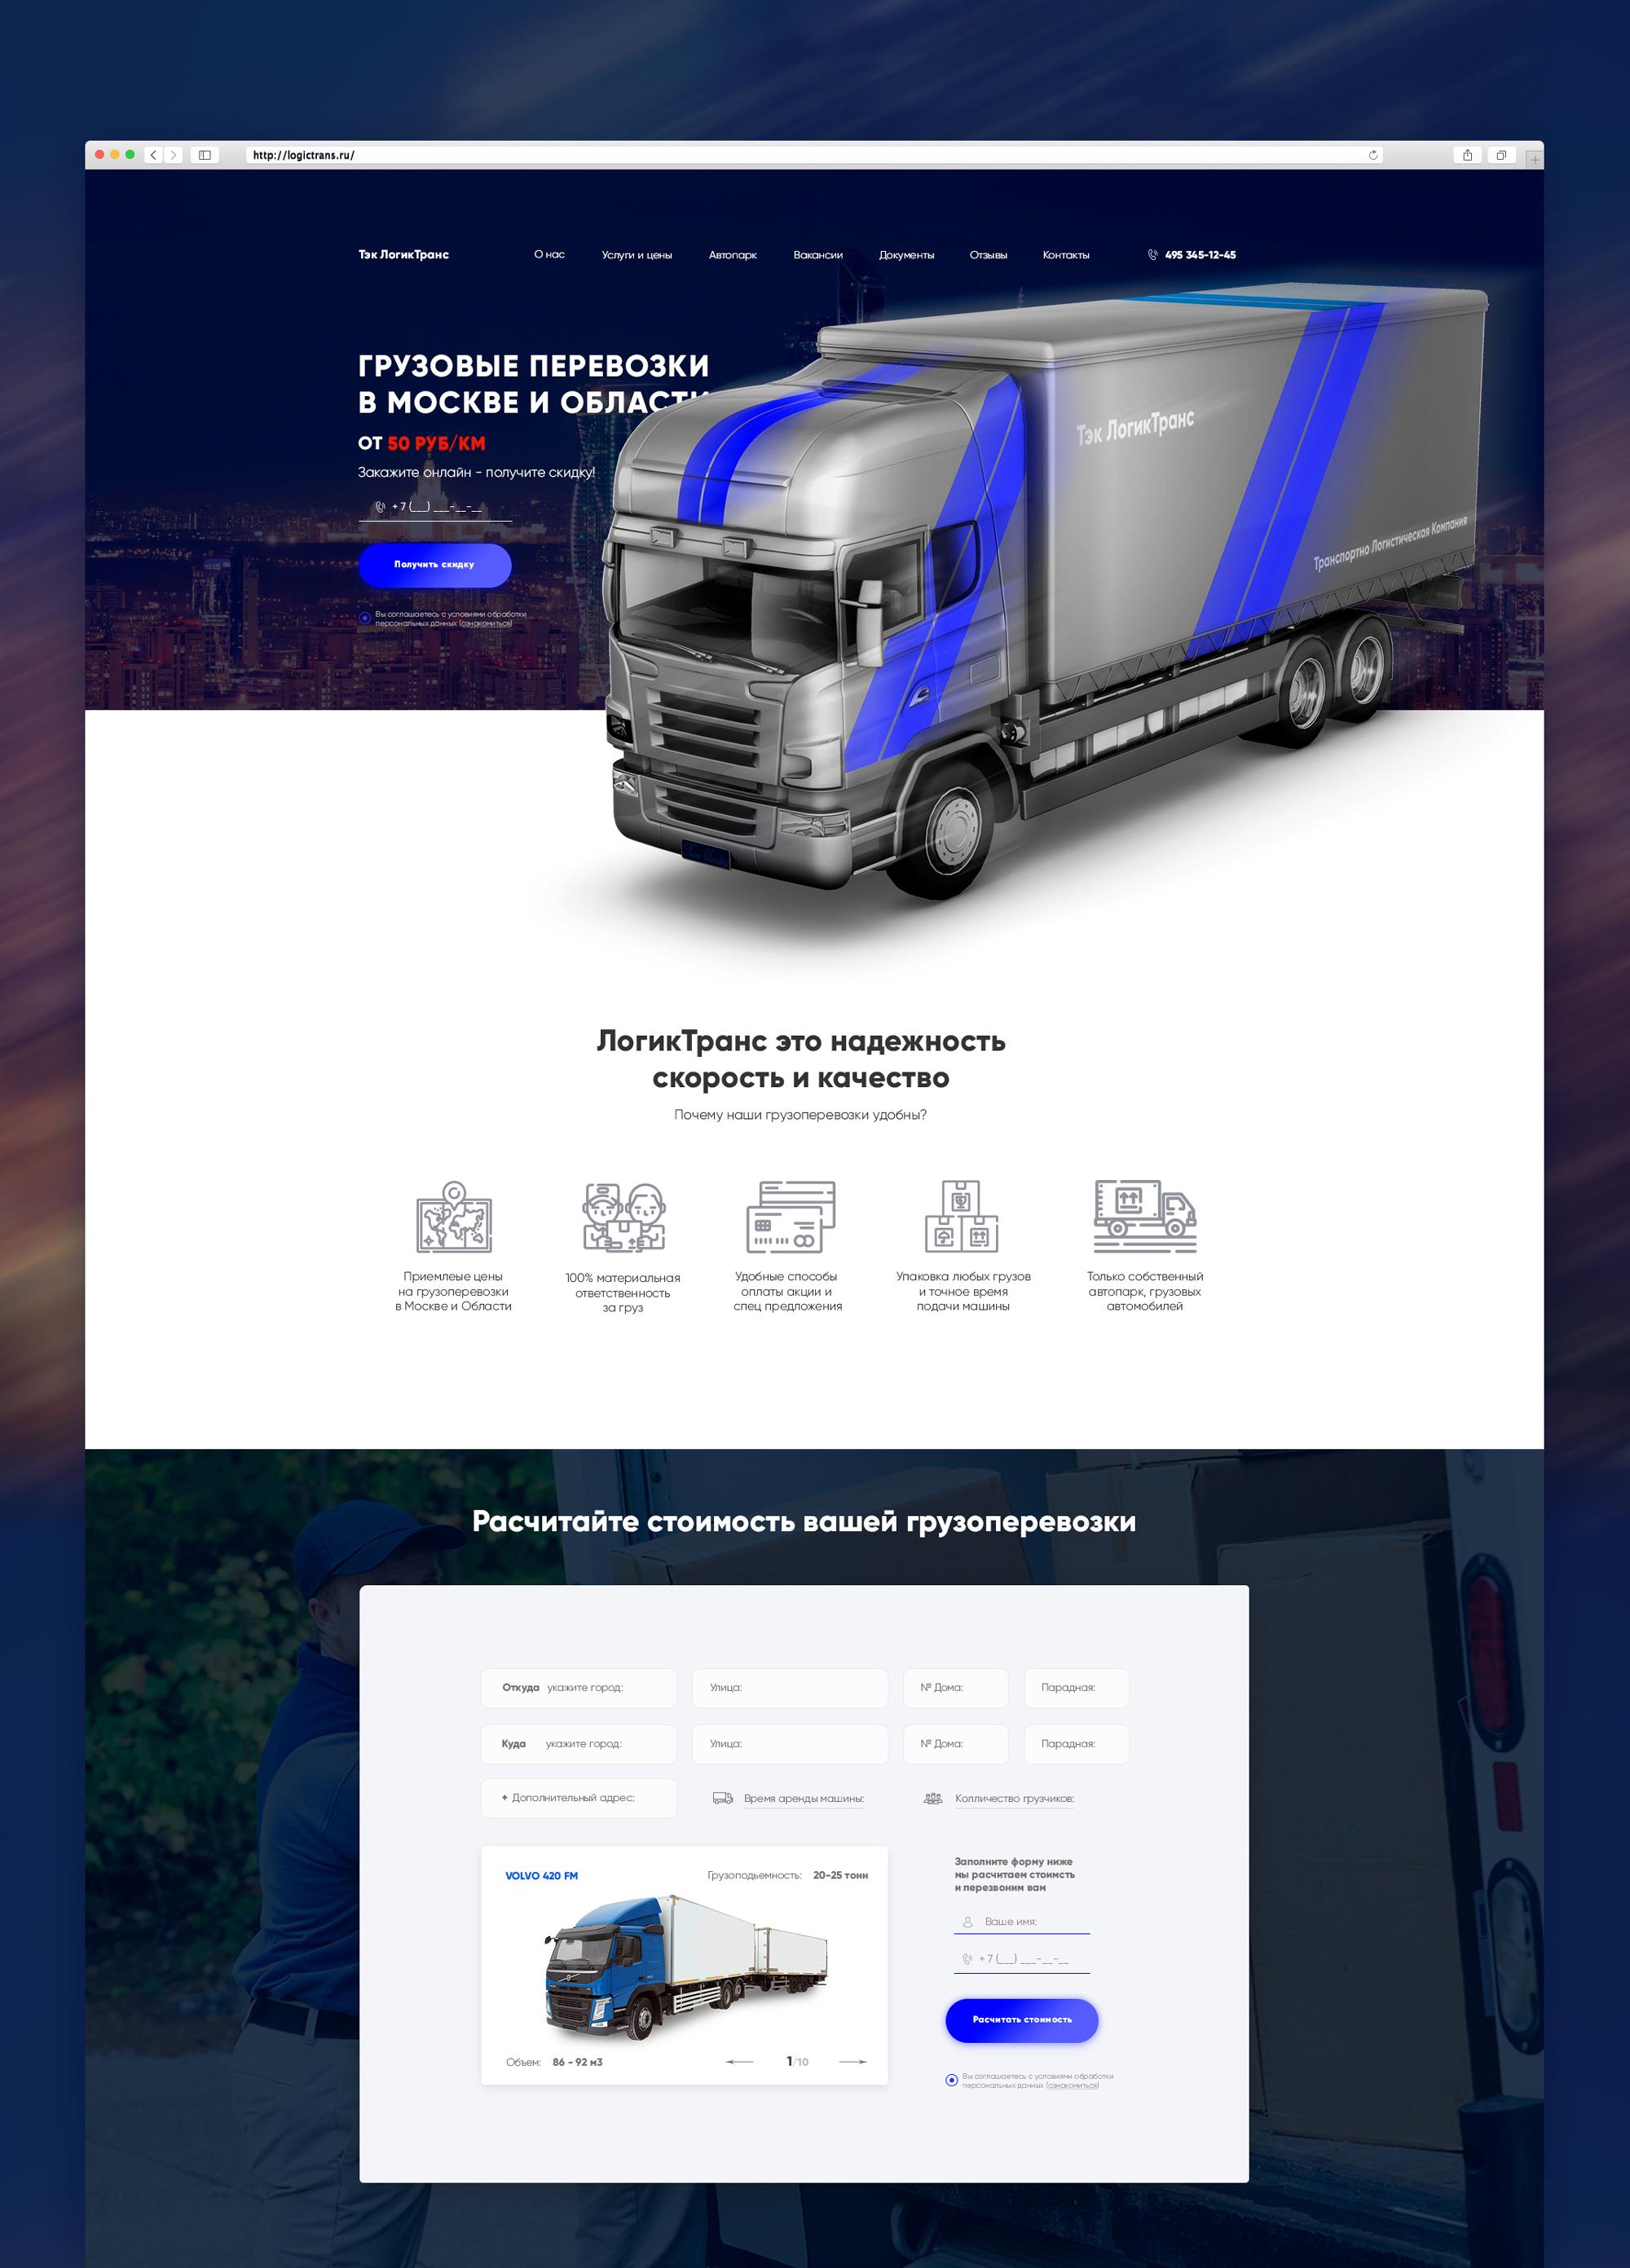 Дизайн сайта транспортно-экспедиторской компании ЛогикТранс фото f_7645a42a61bd4f54.jpg